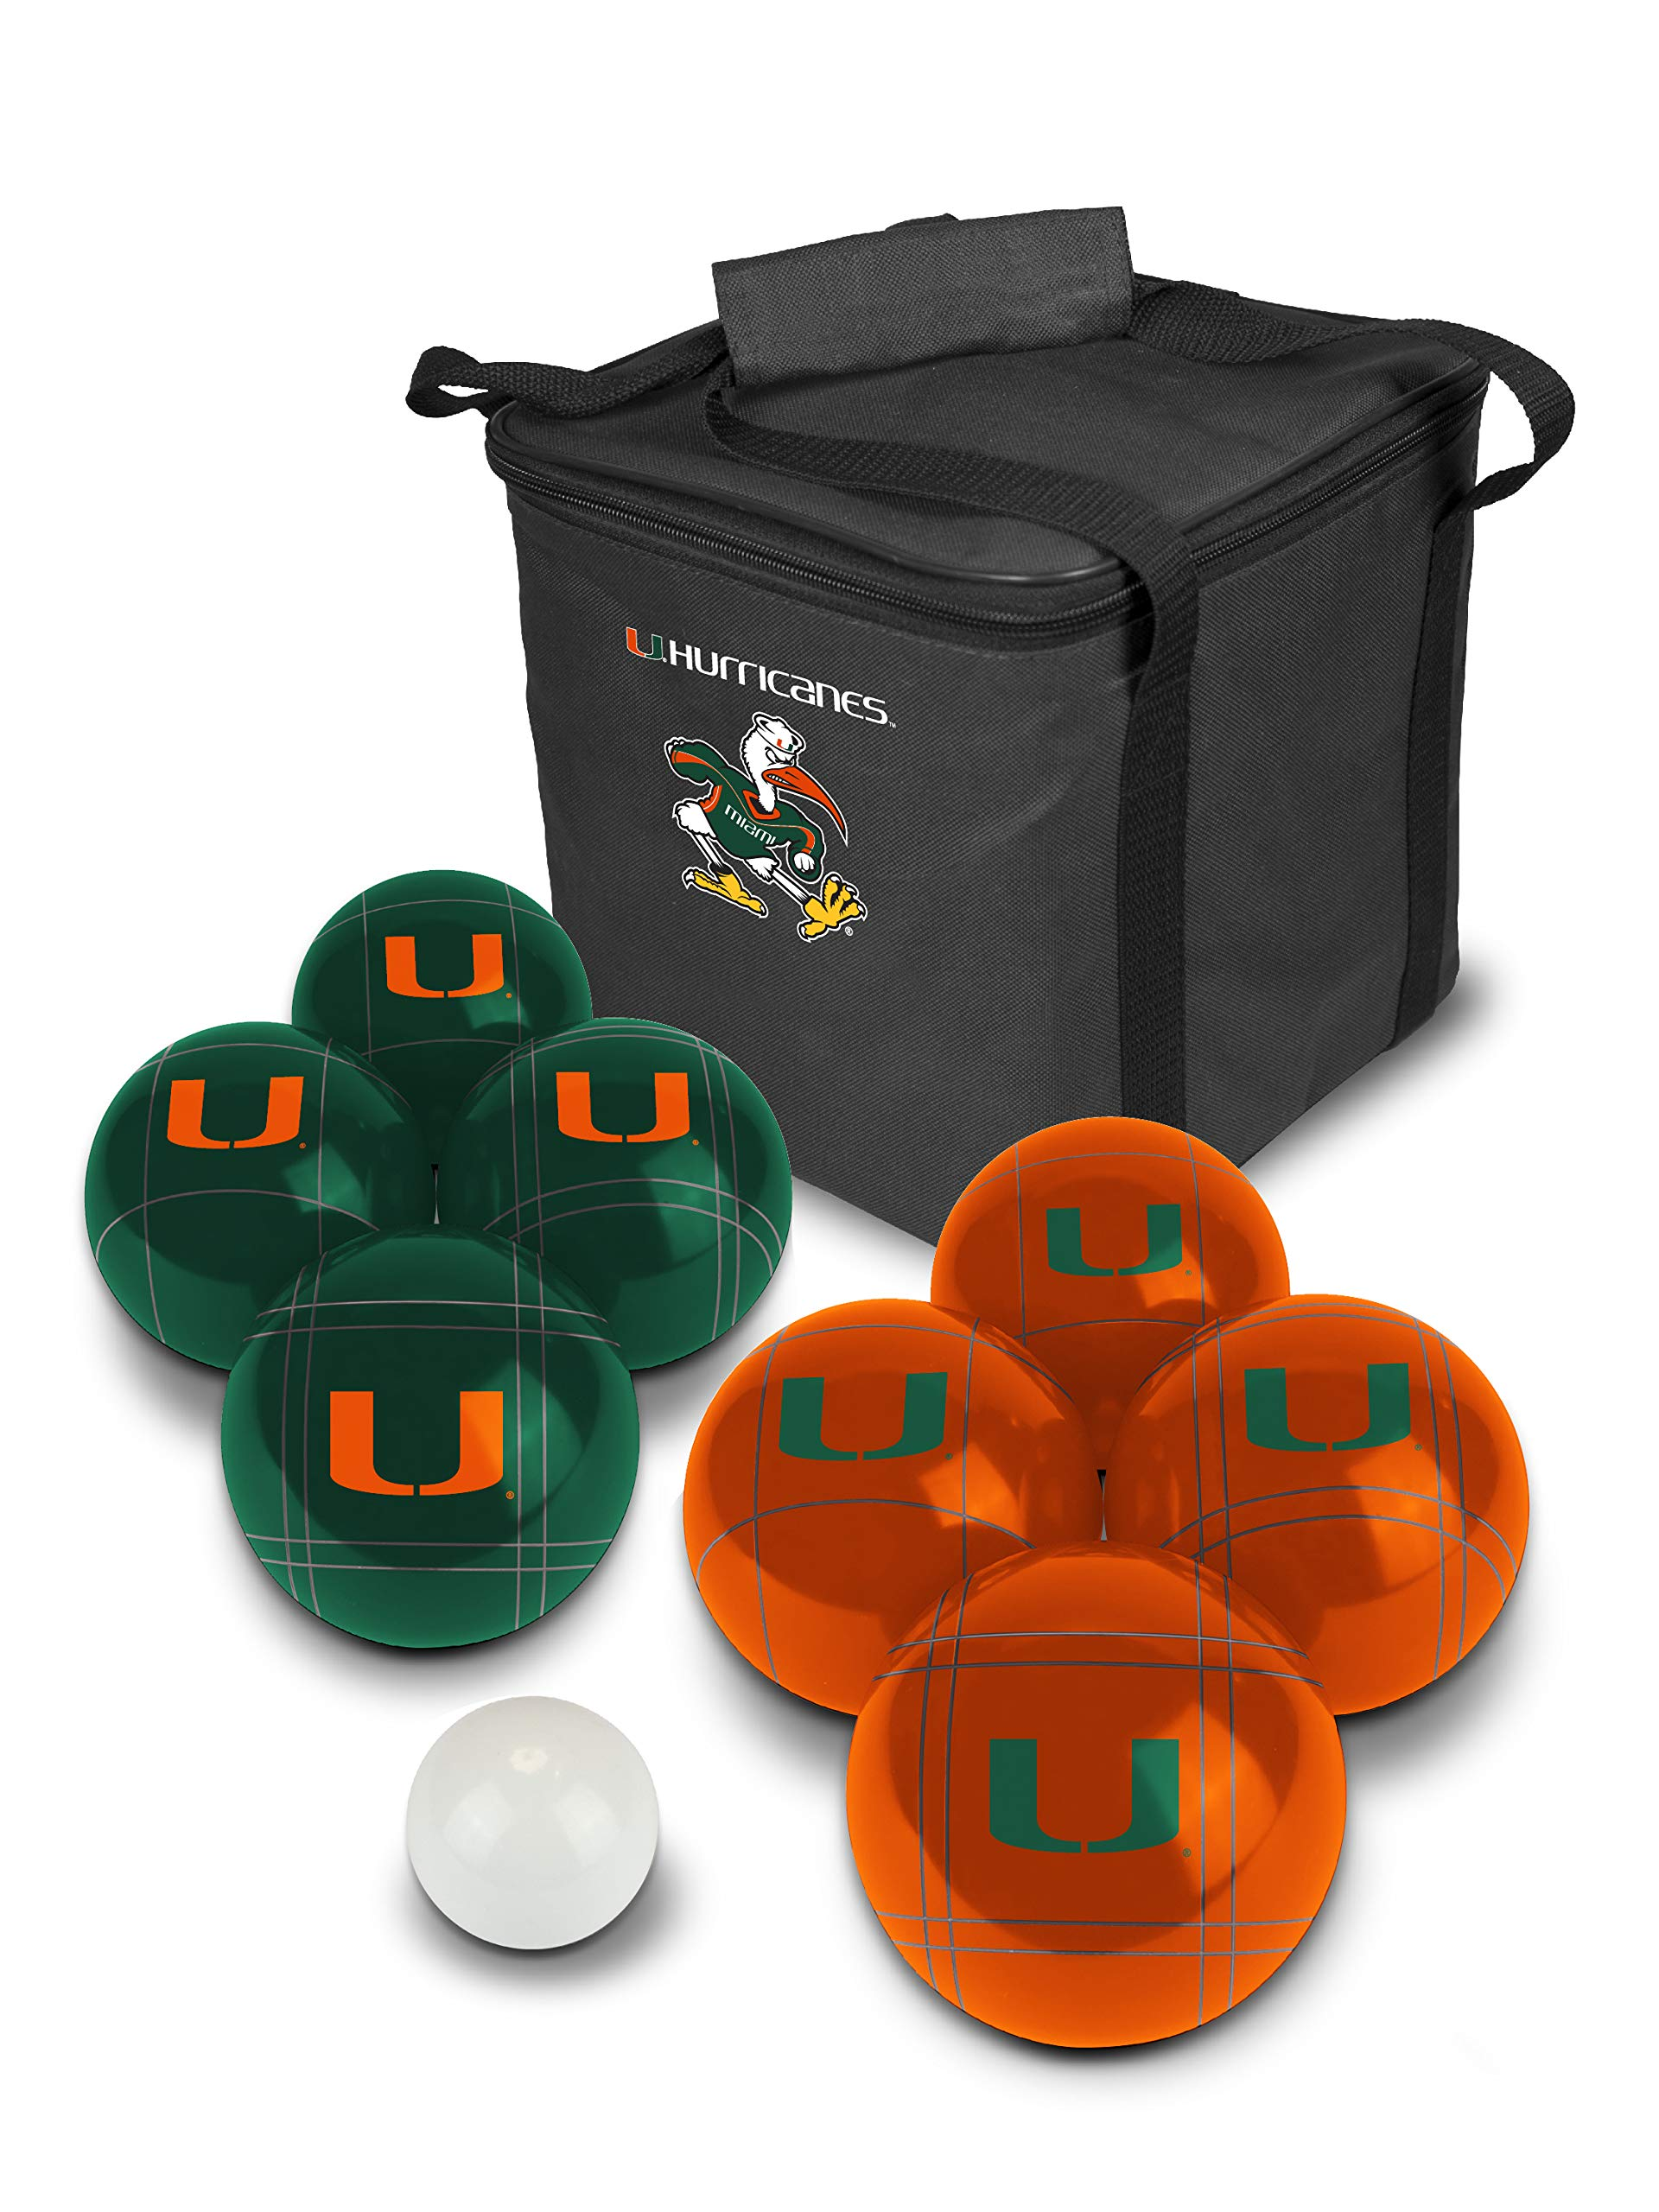 PROLINE NCAA College Miami Hurricanes Bocce Ball Set by PROLINE